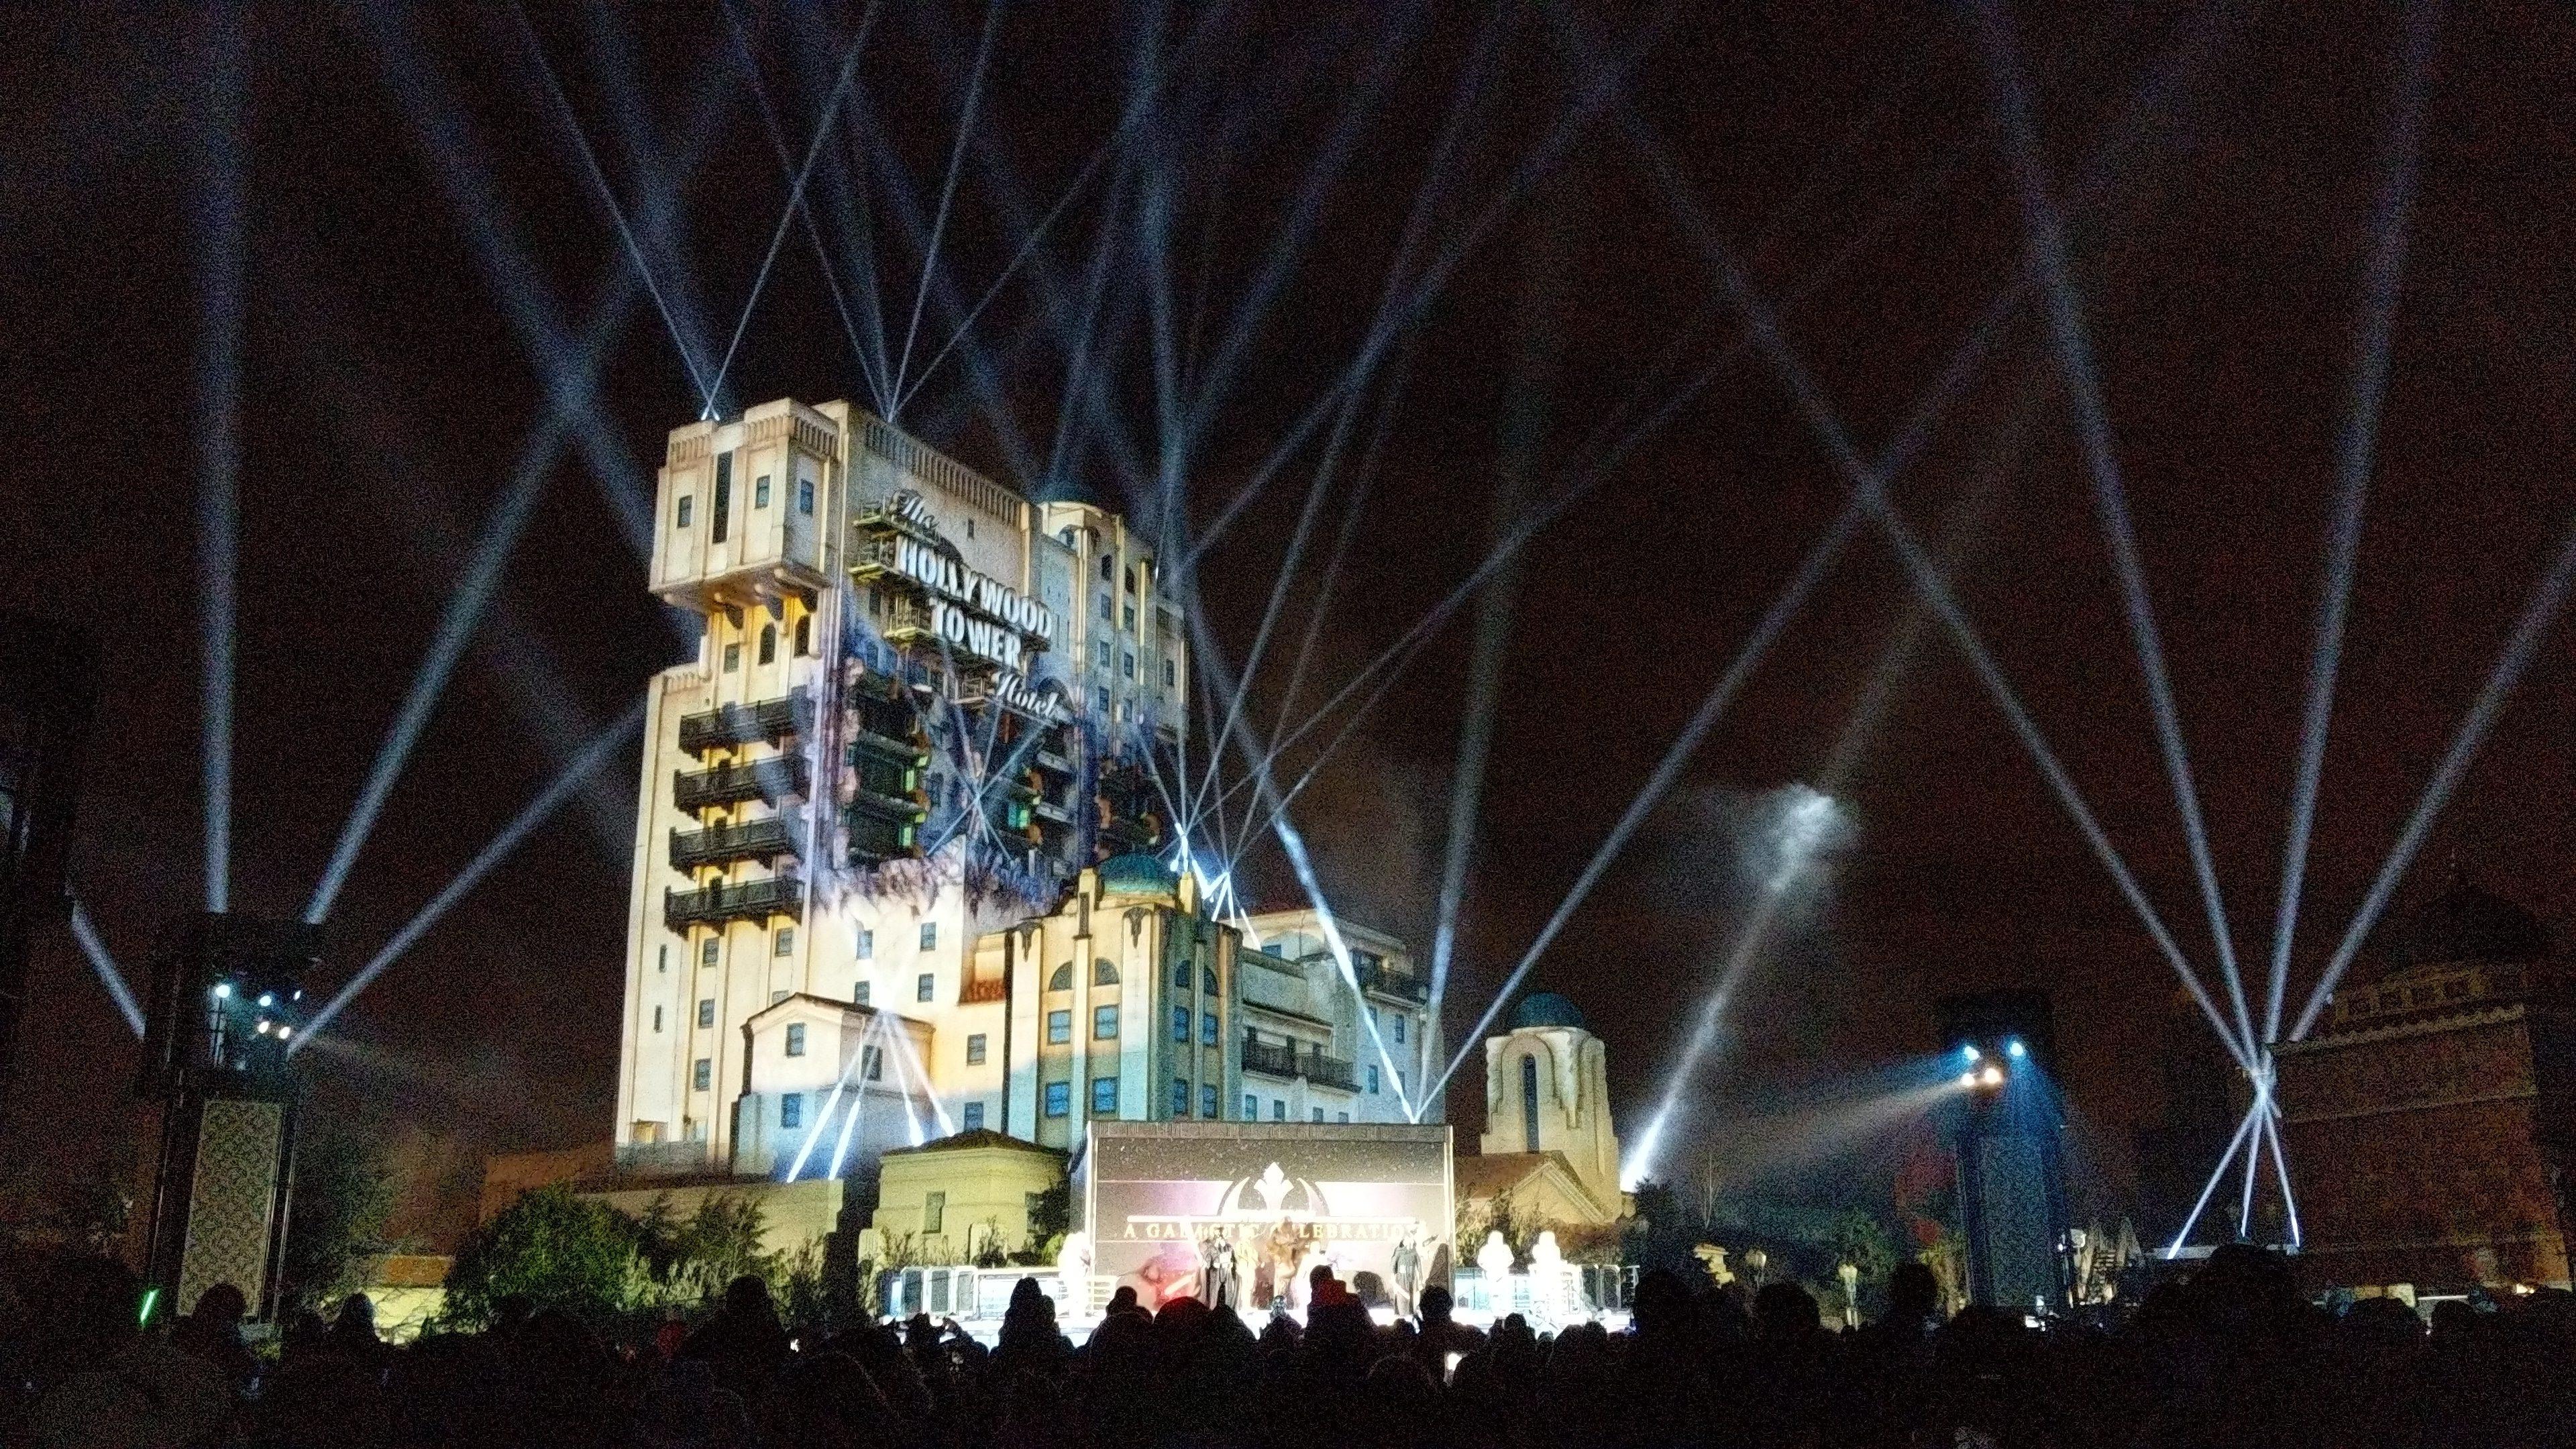 Disneyland Paris - Season of the Force 2018 - A Galactic Celebration (2)